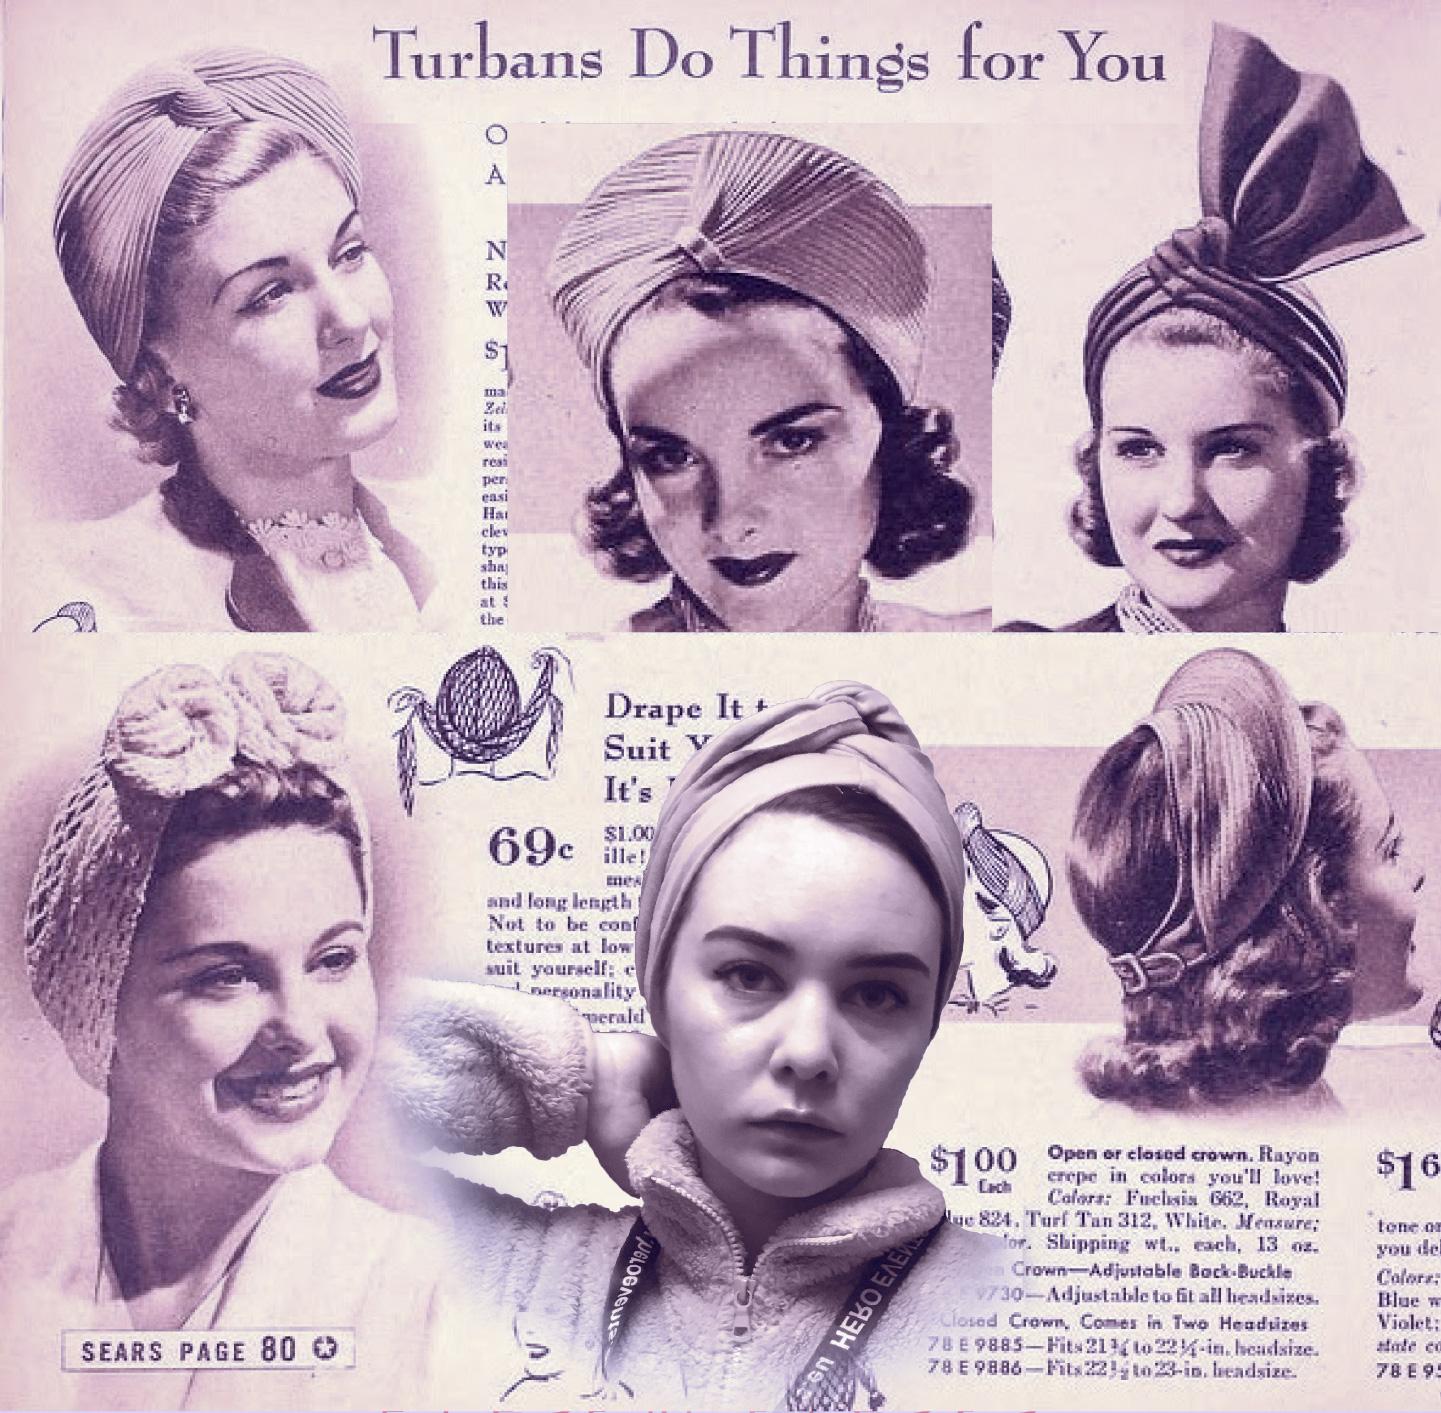 vintage turban-hat inspiration